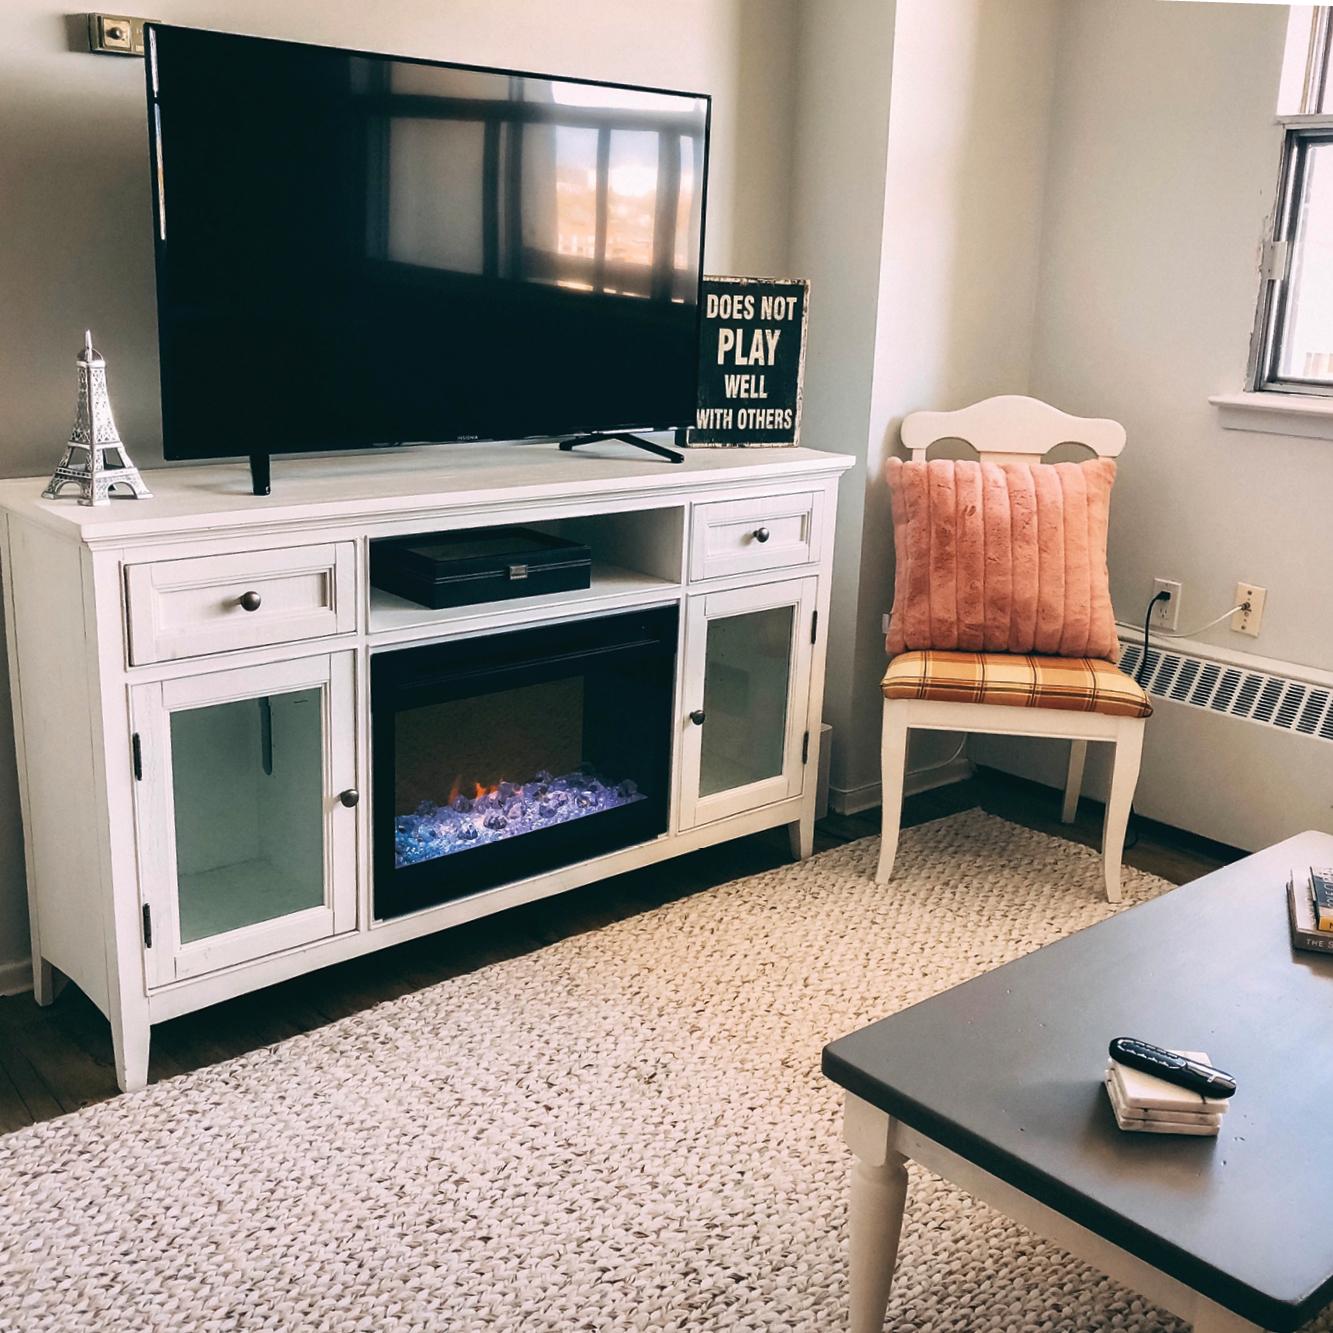 Transform a Boring Apartment into a Relaxing Home